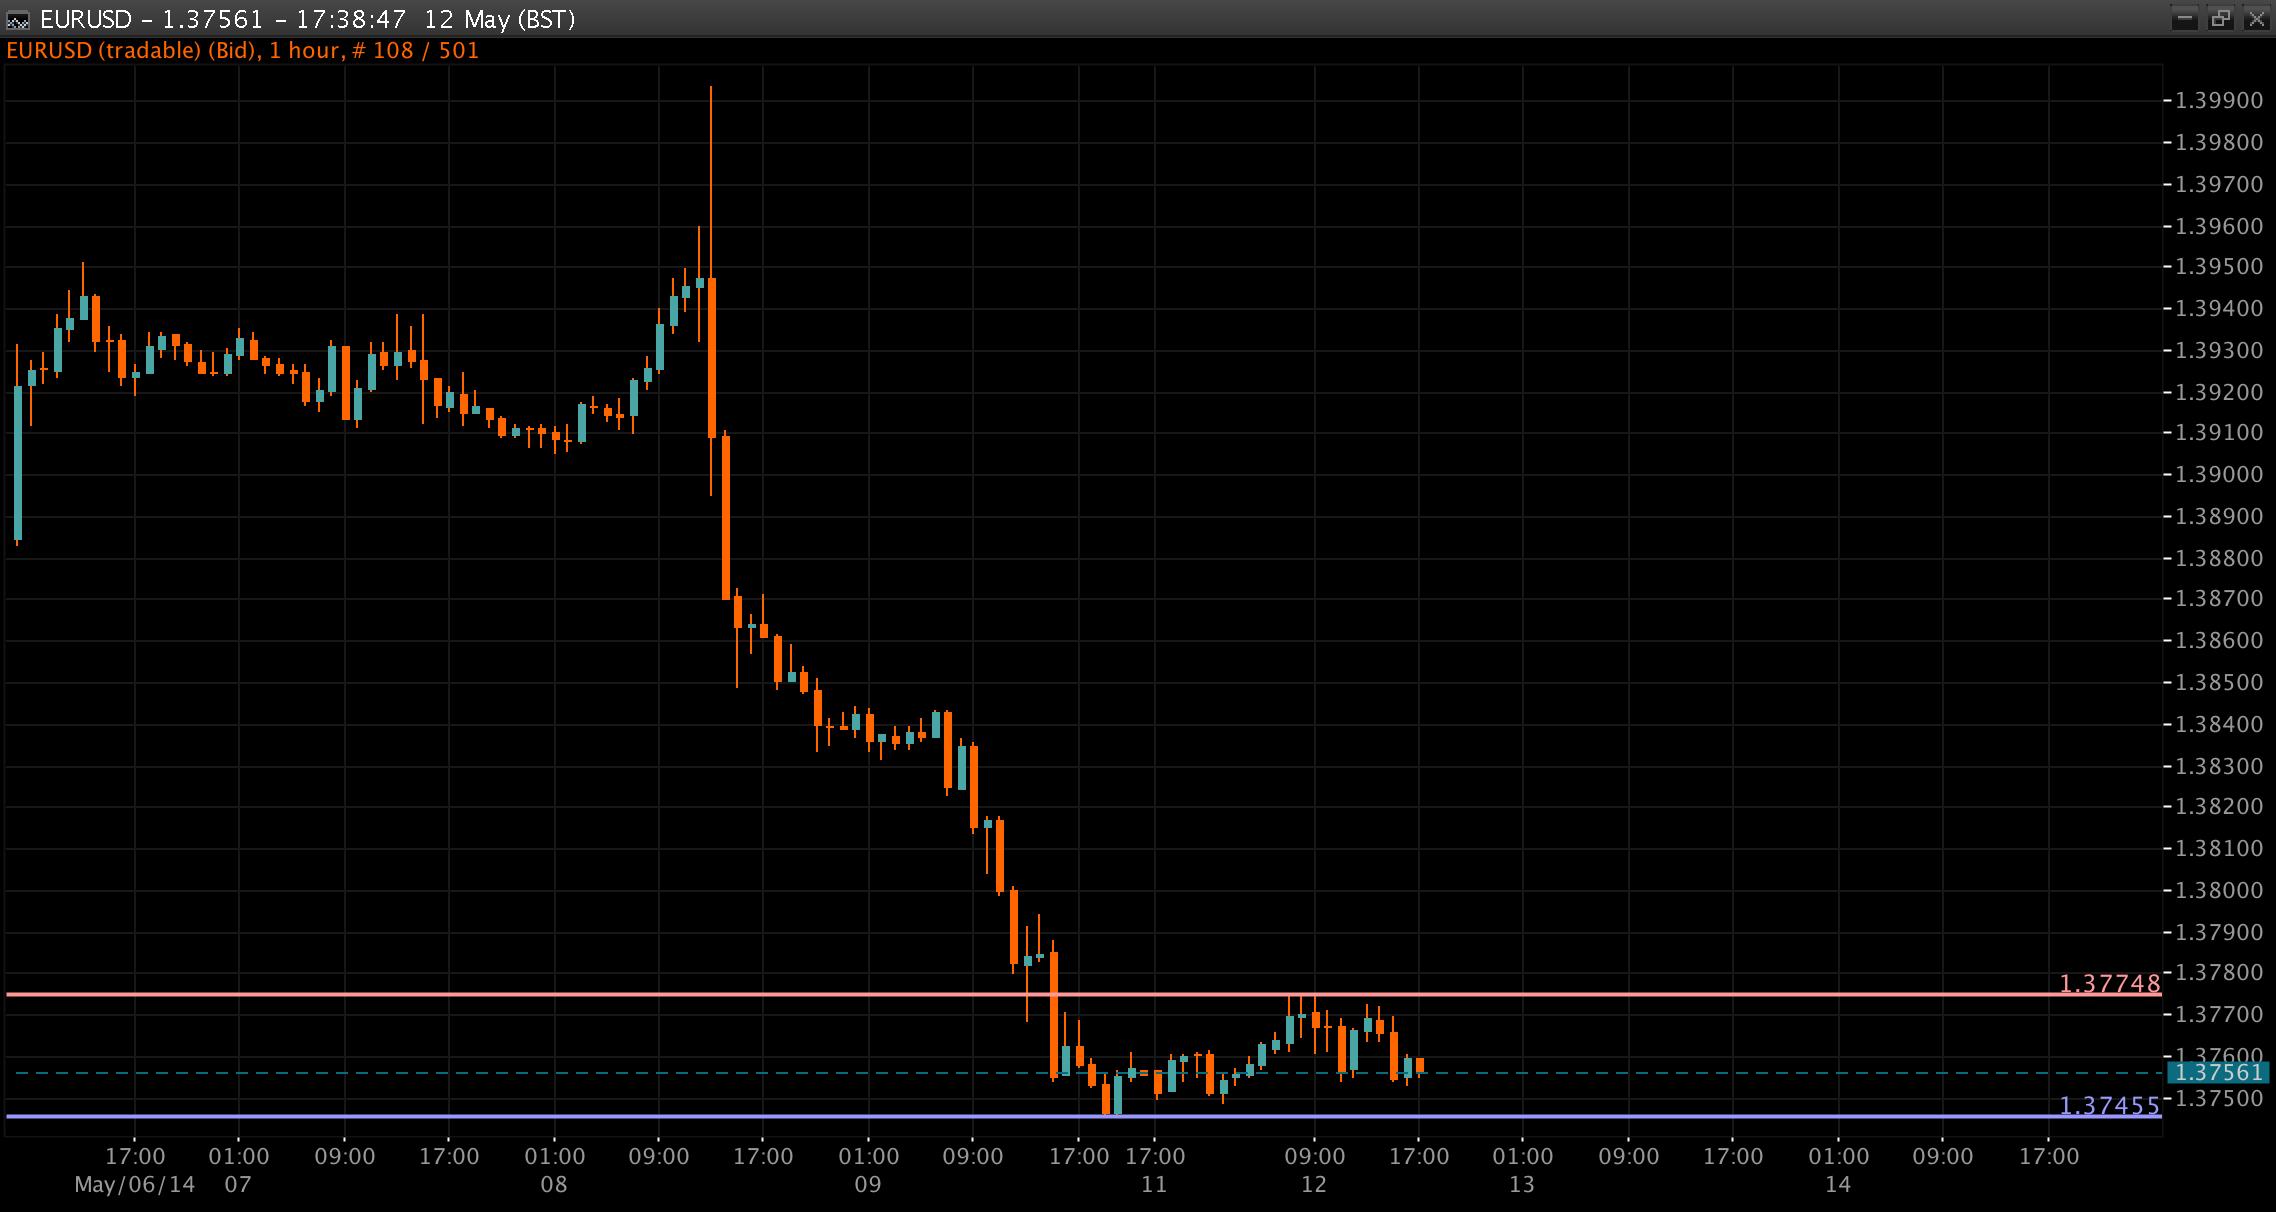 EUR/USD Chart 12 May 2014